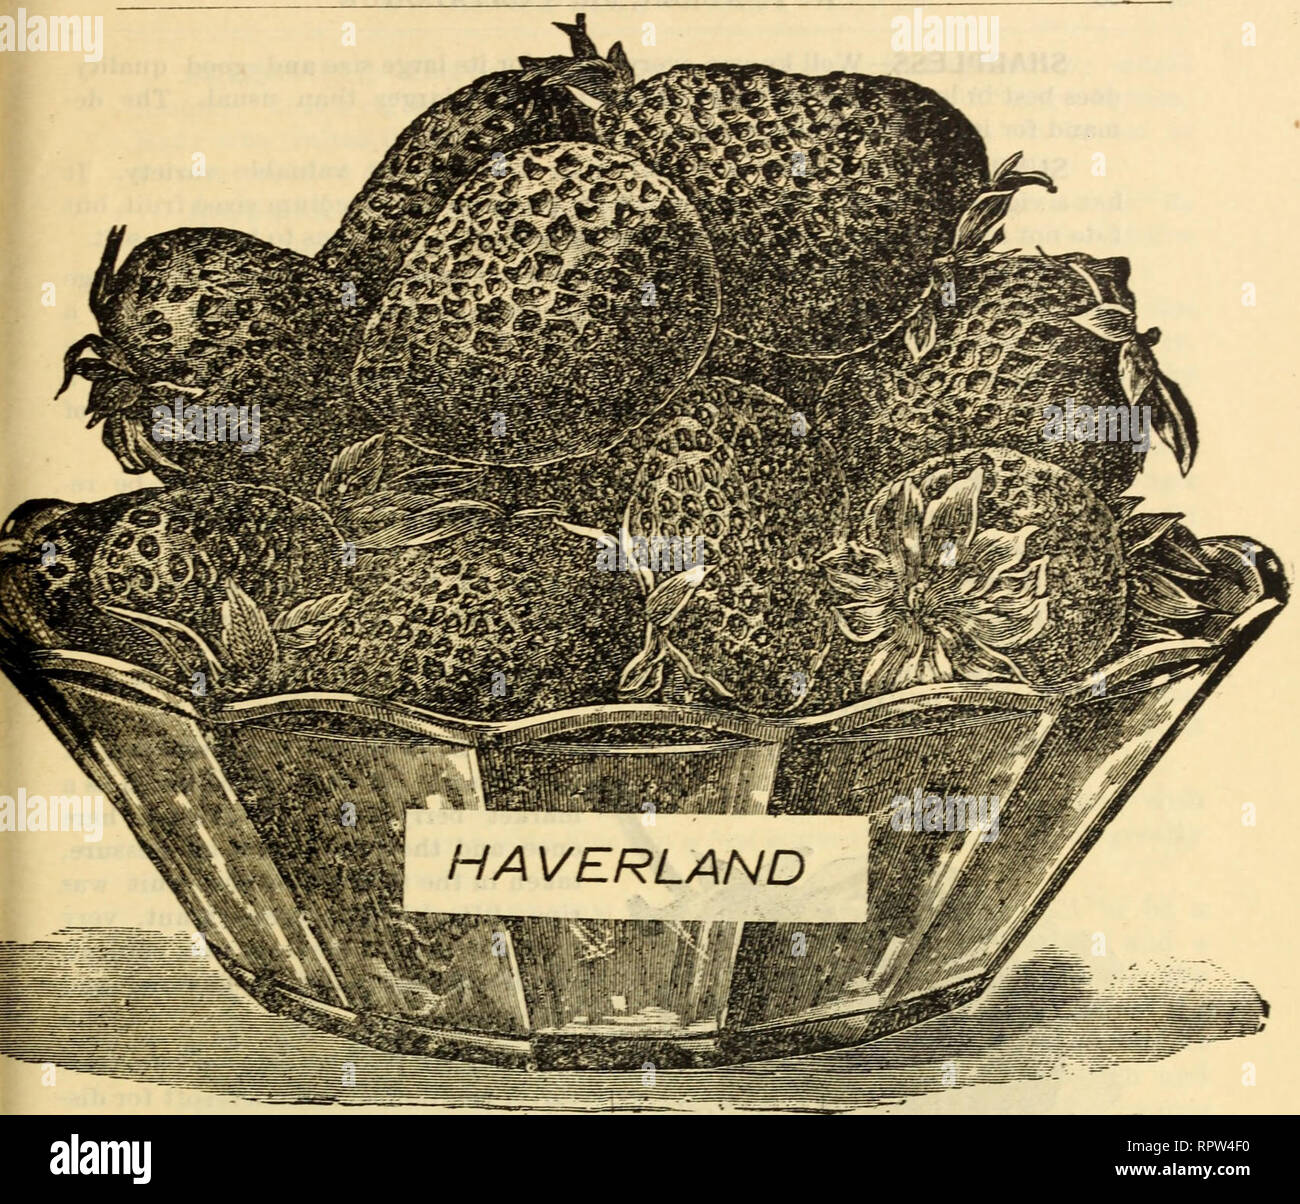 Allen's strawberry catalogue  Nurseries (Horticulture